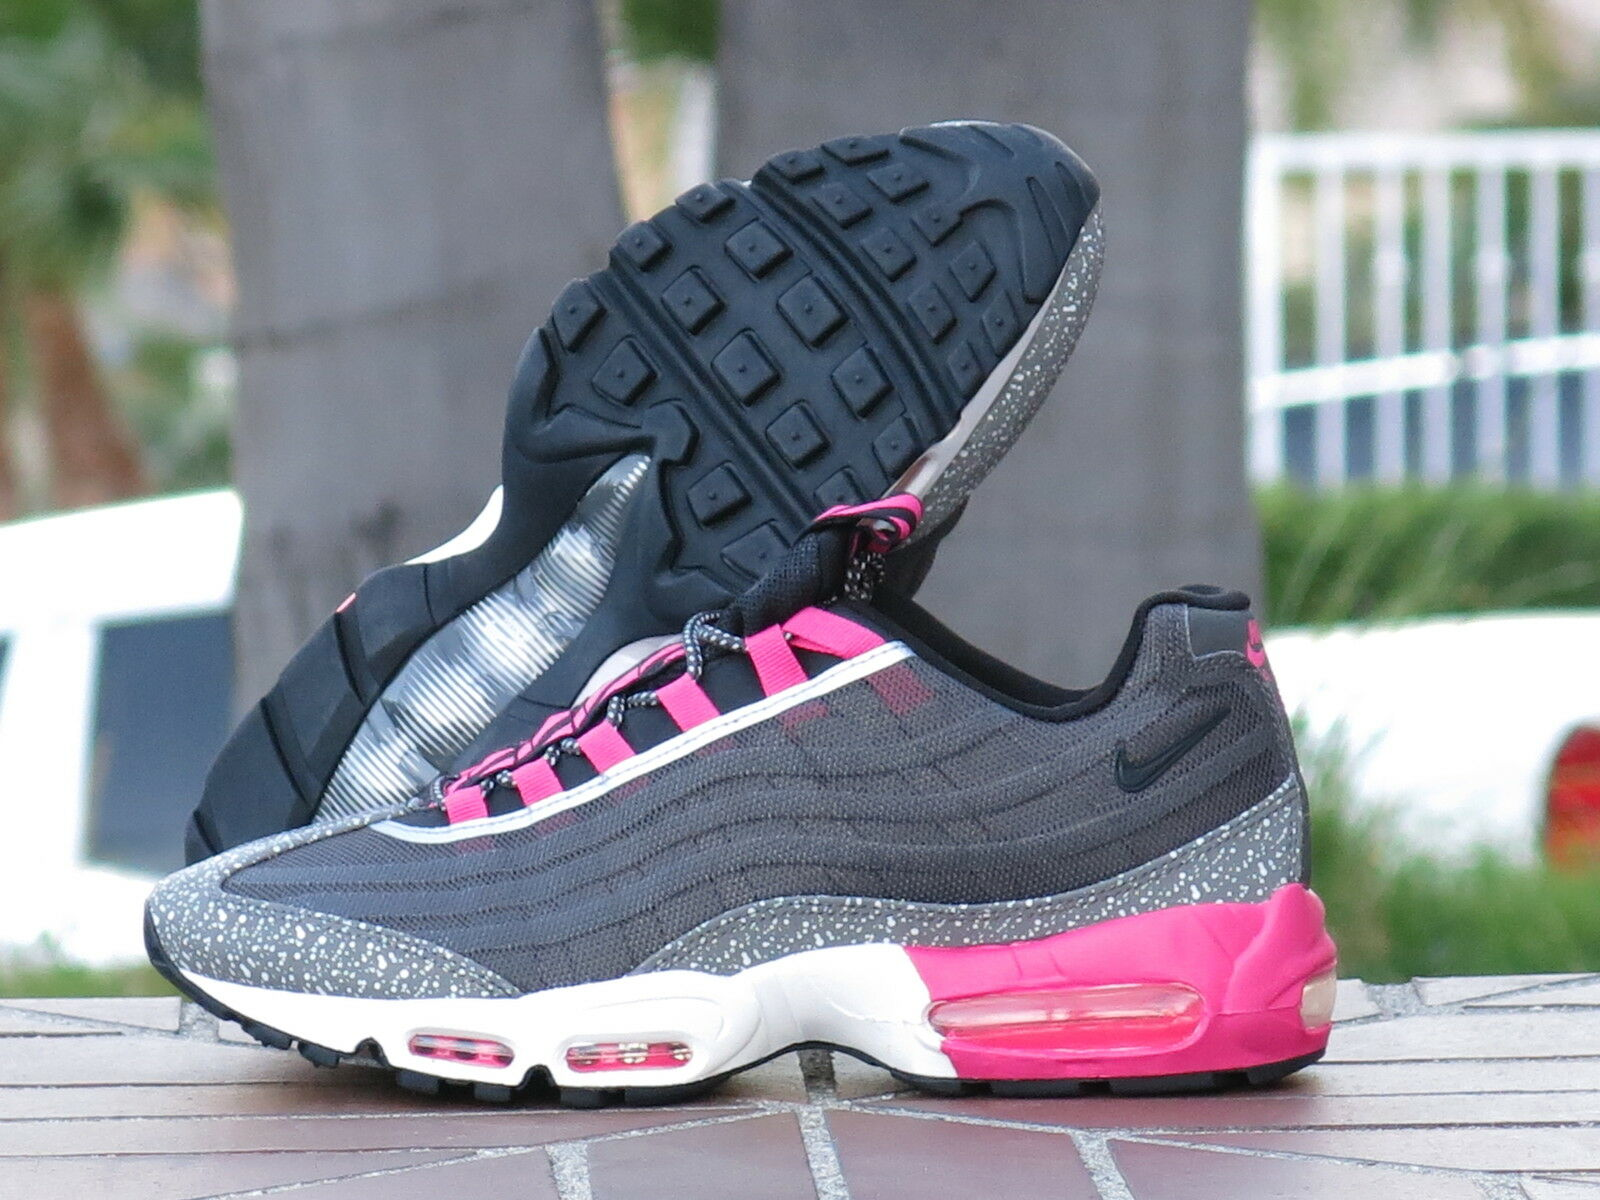 Nike Air Max 95 Premium Men's Running, Cross Training Shoes 599425-006 SZ 11.5